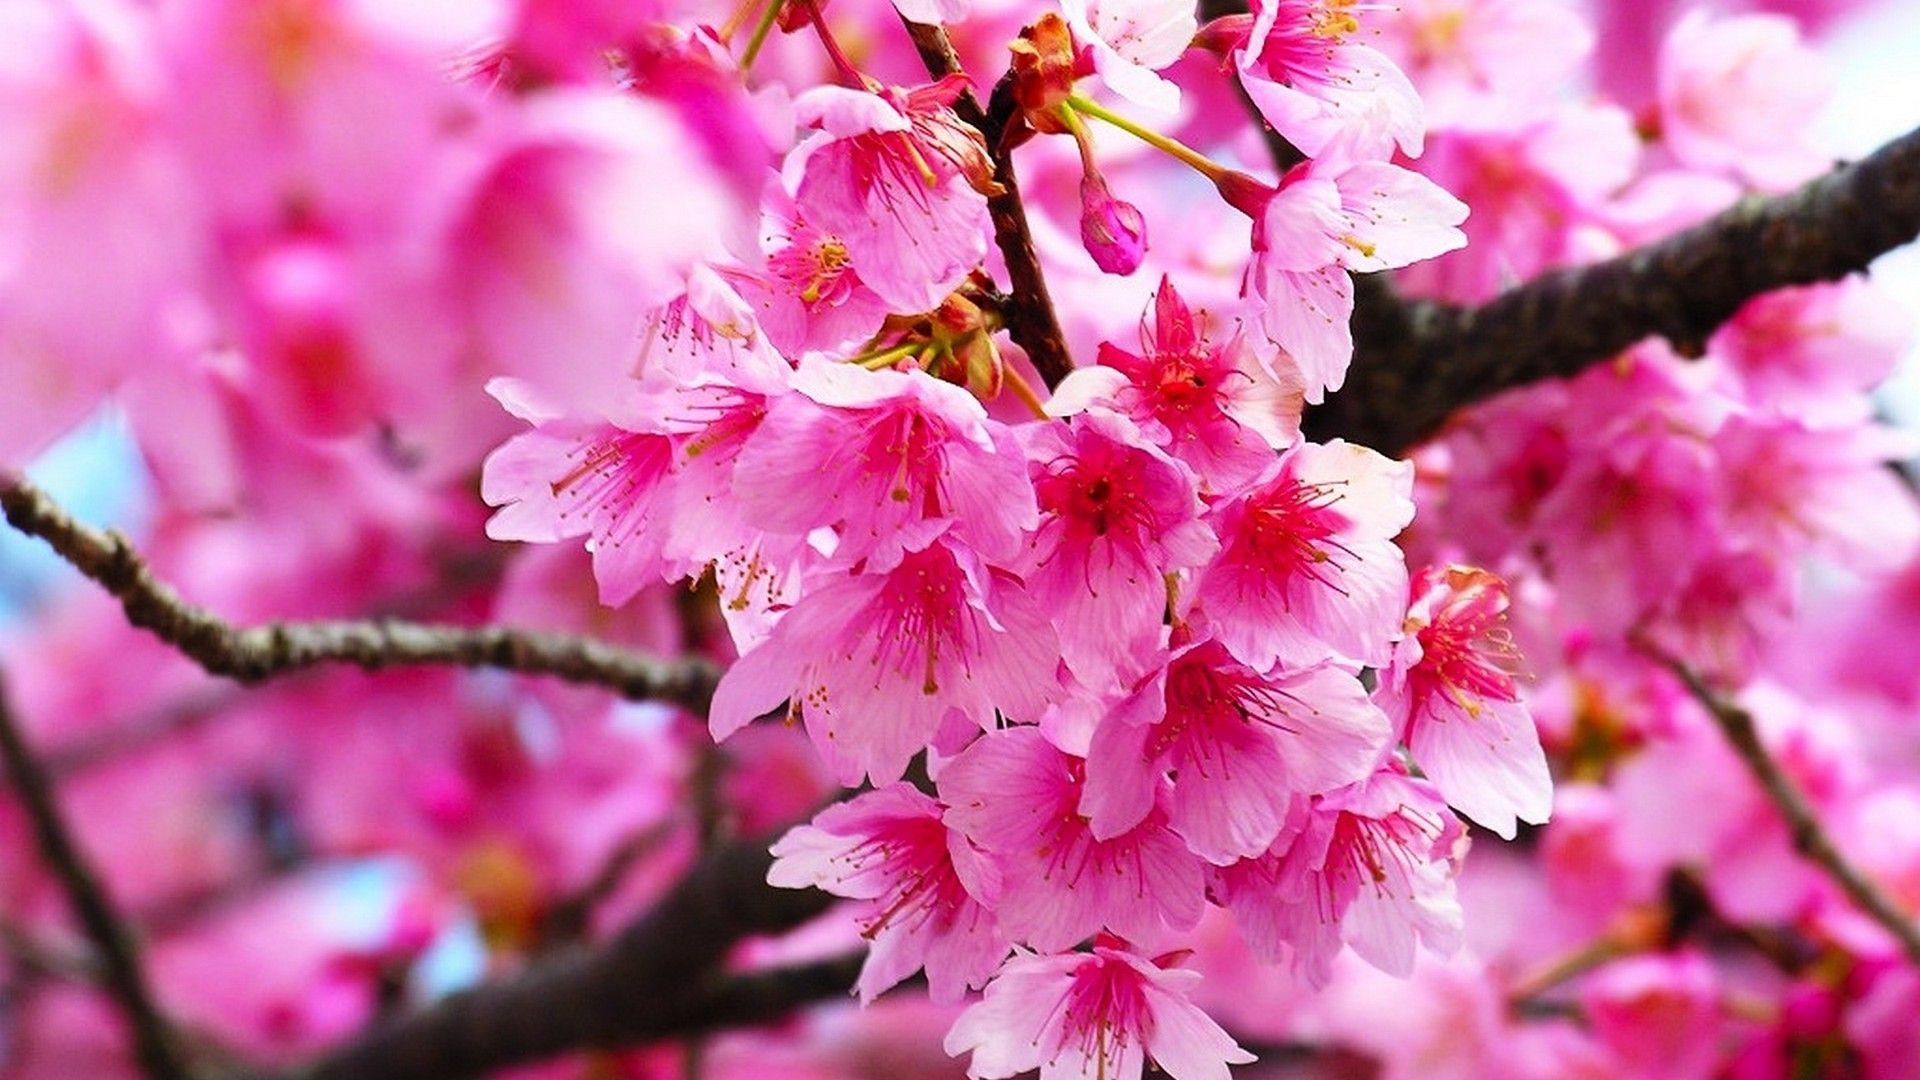 Pink Cherry Blossom Wallpaper HD Best HD Wallpapers